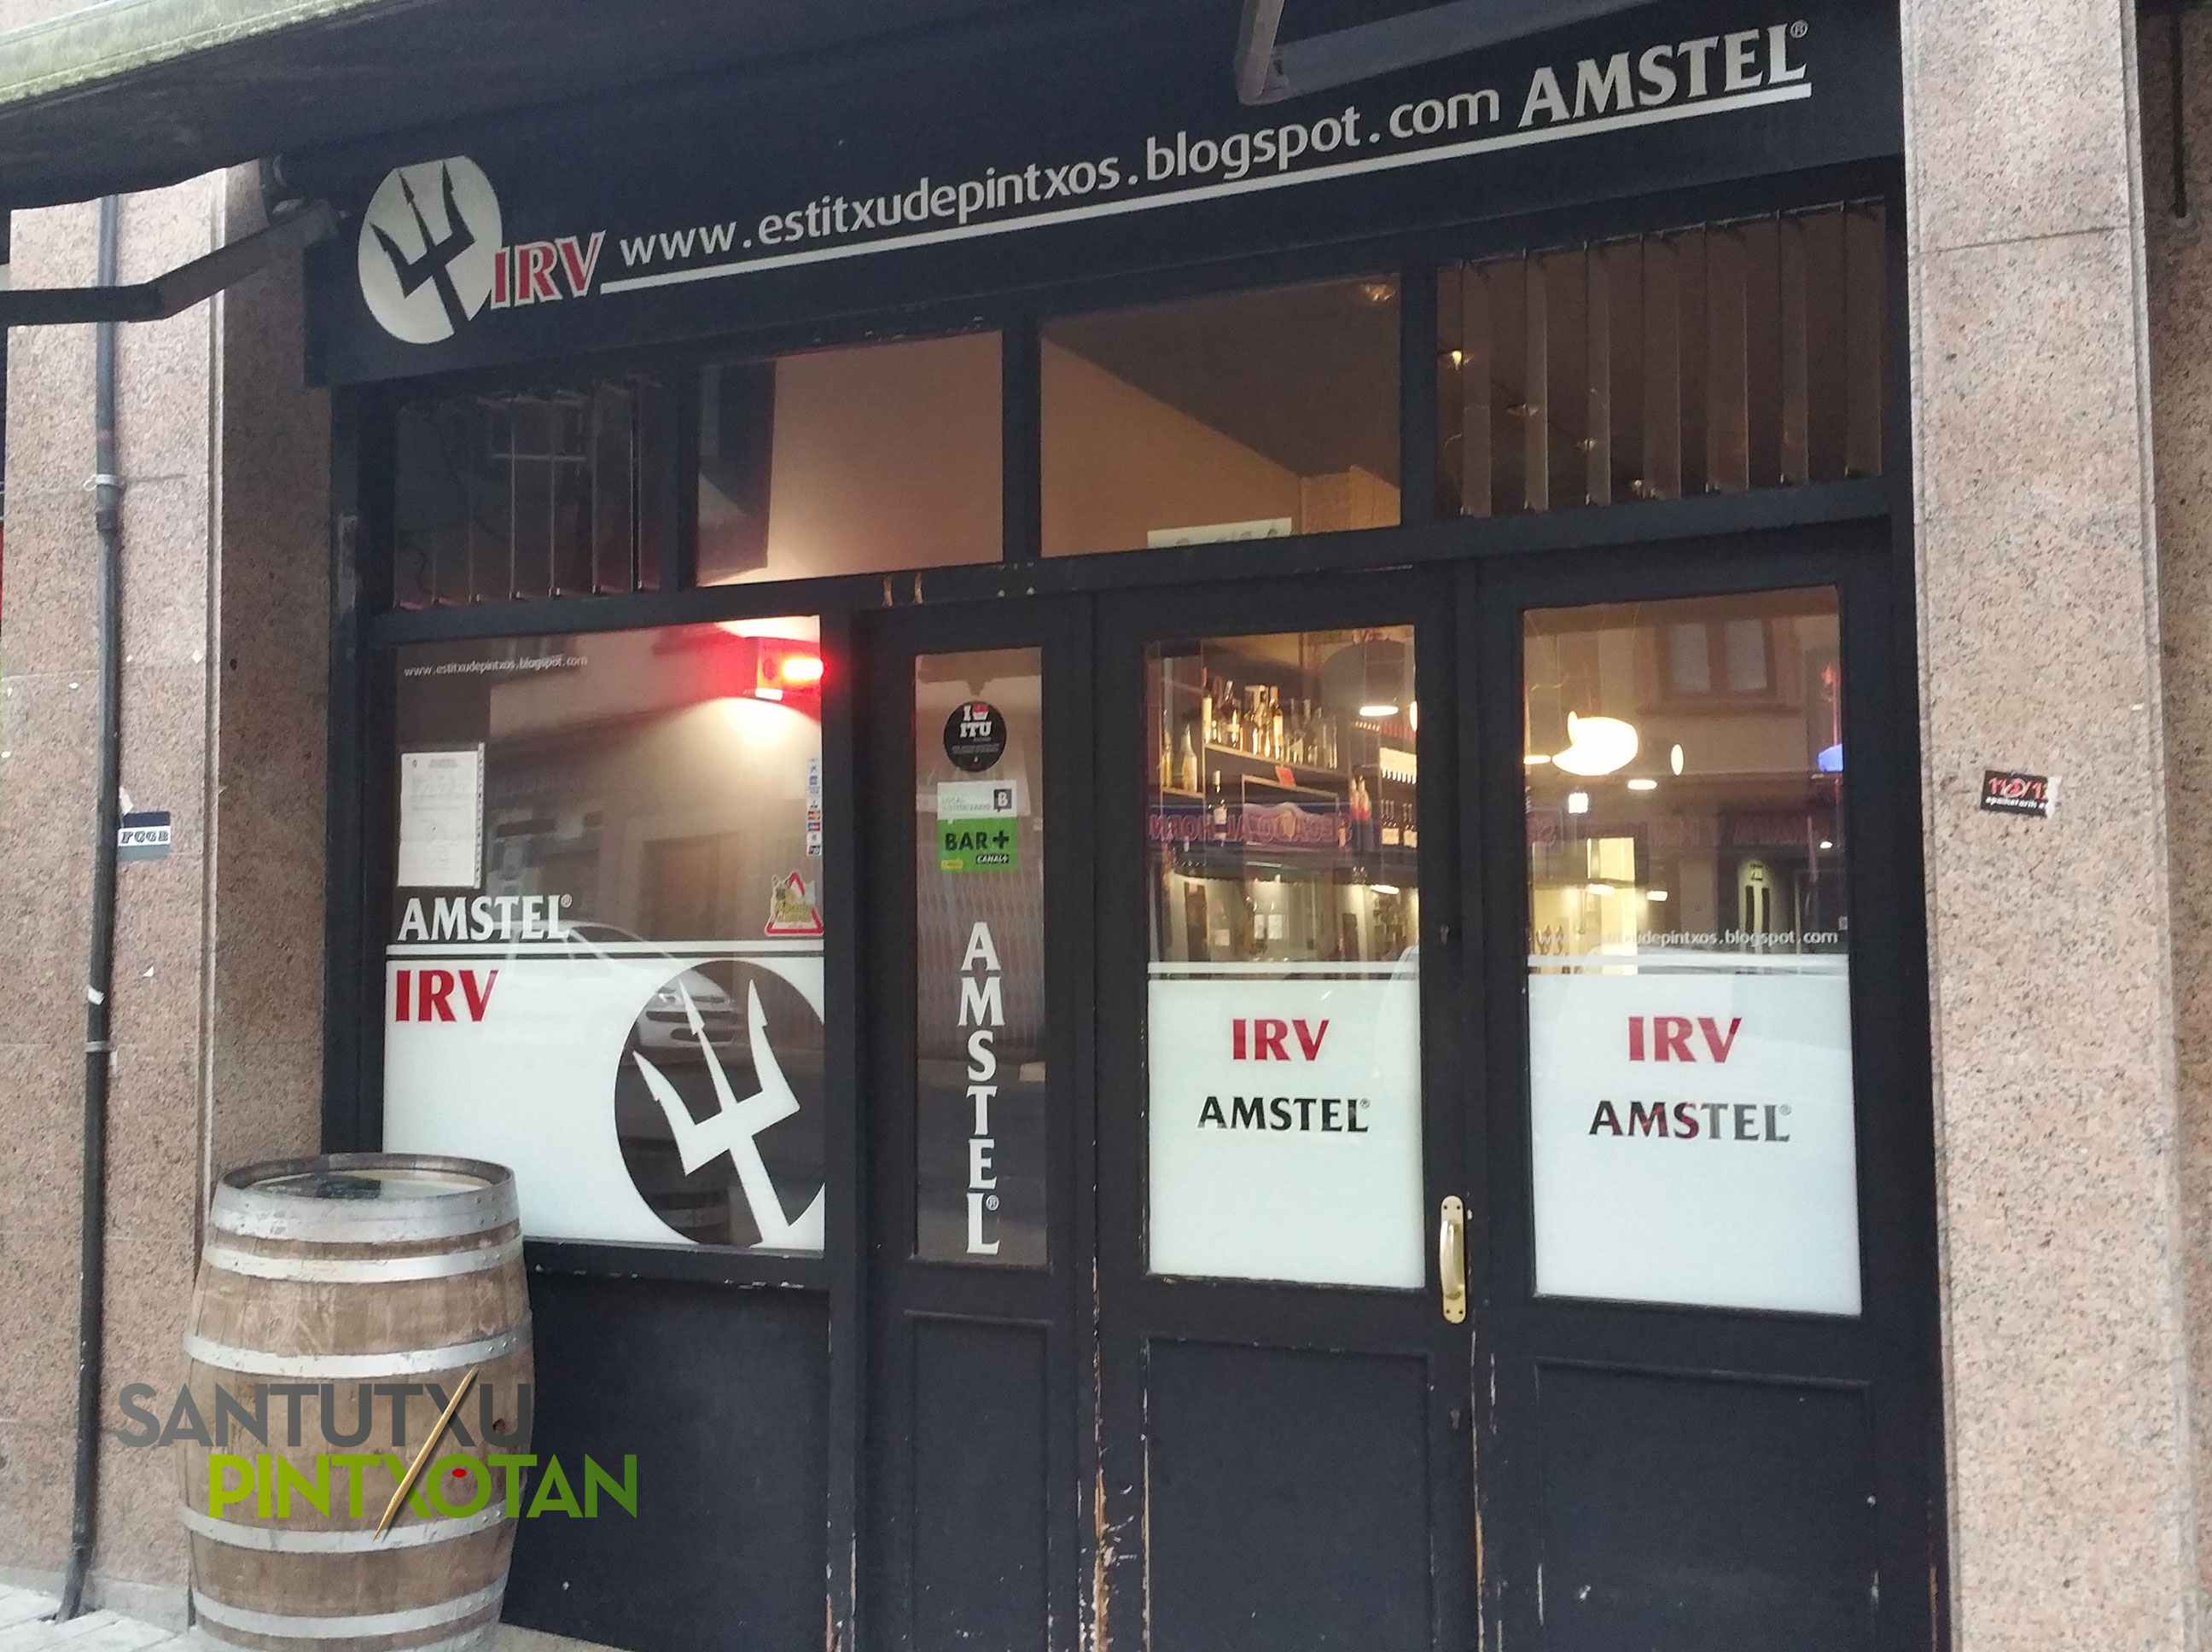 Bar IRV - Santutxu pintxotan